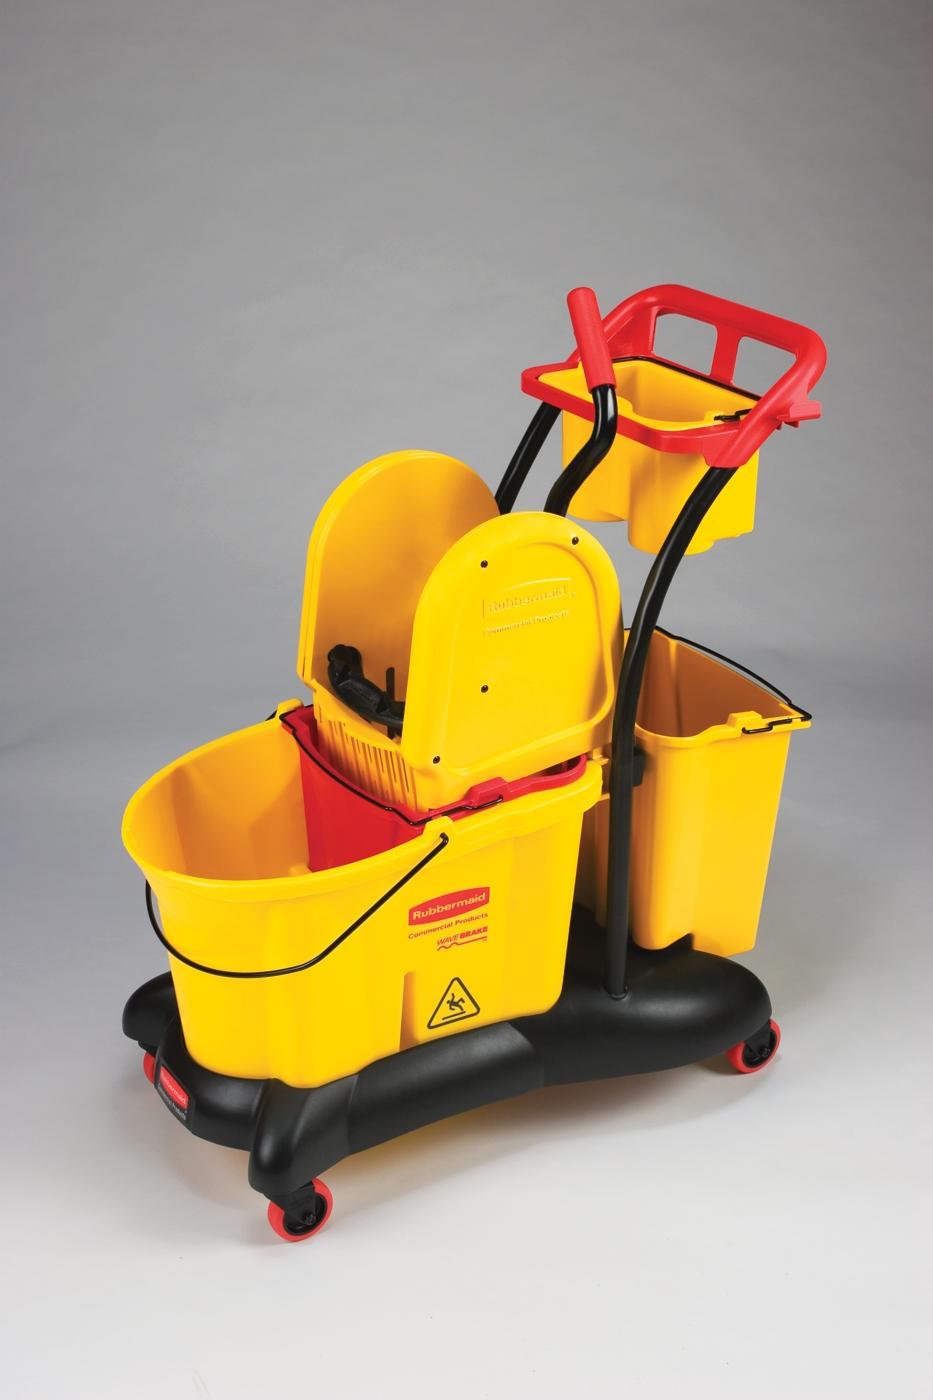 Chariot de menage wavebrake rubbermaid jaune avec presse for Chariot de menage rubbermaid